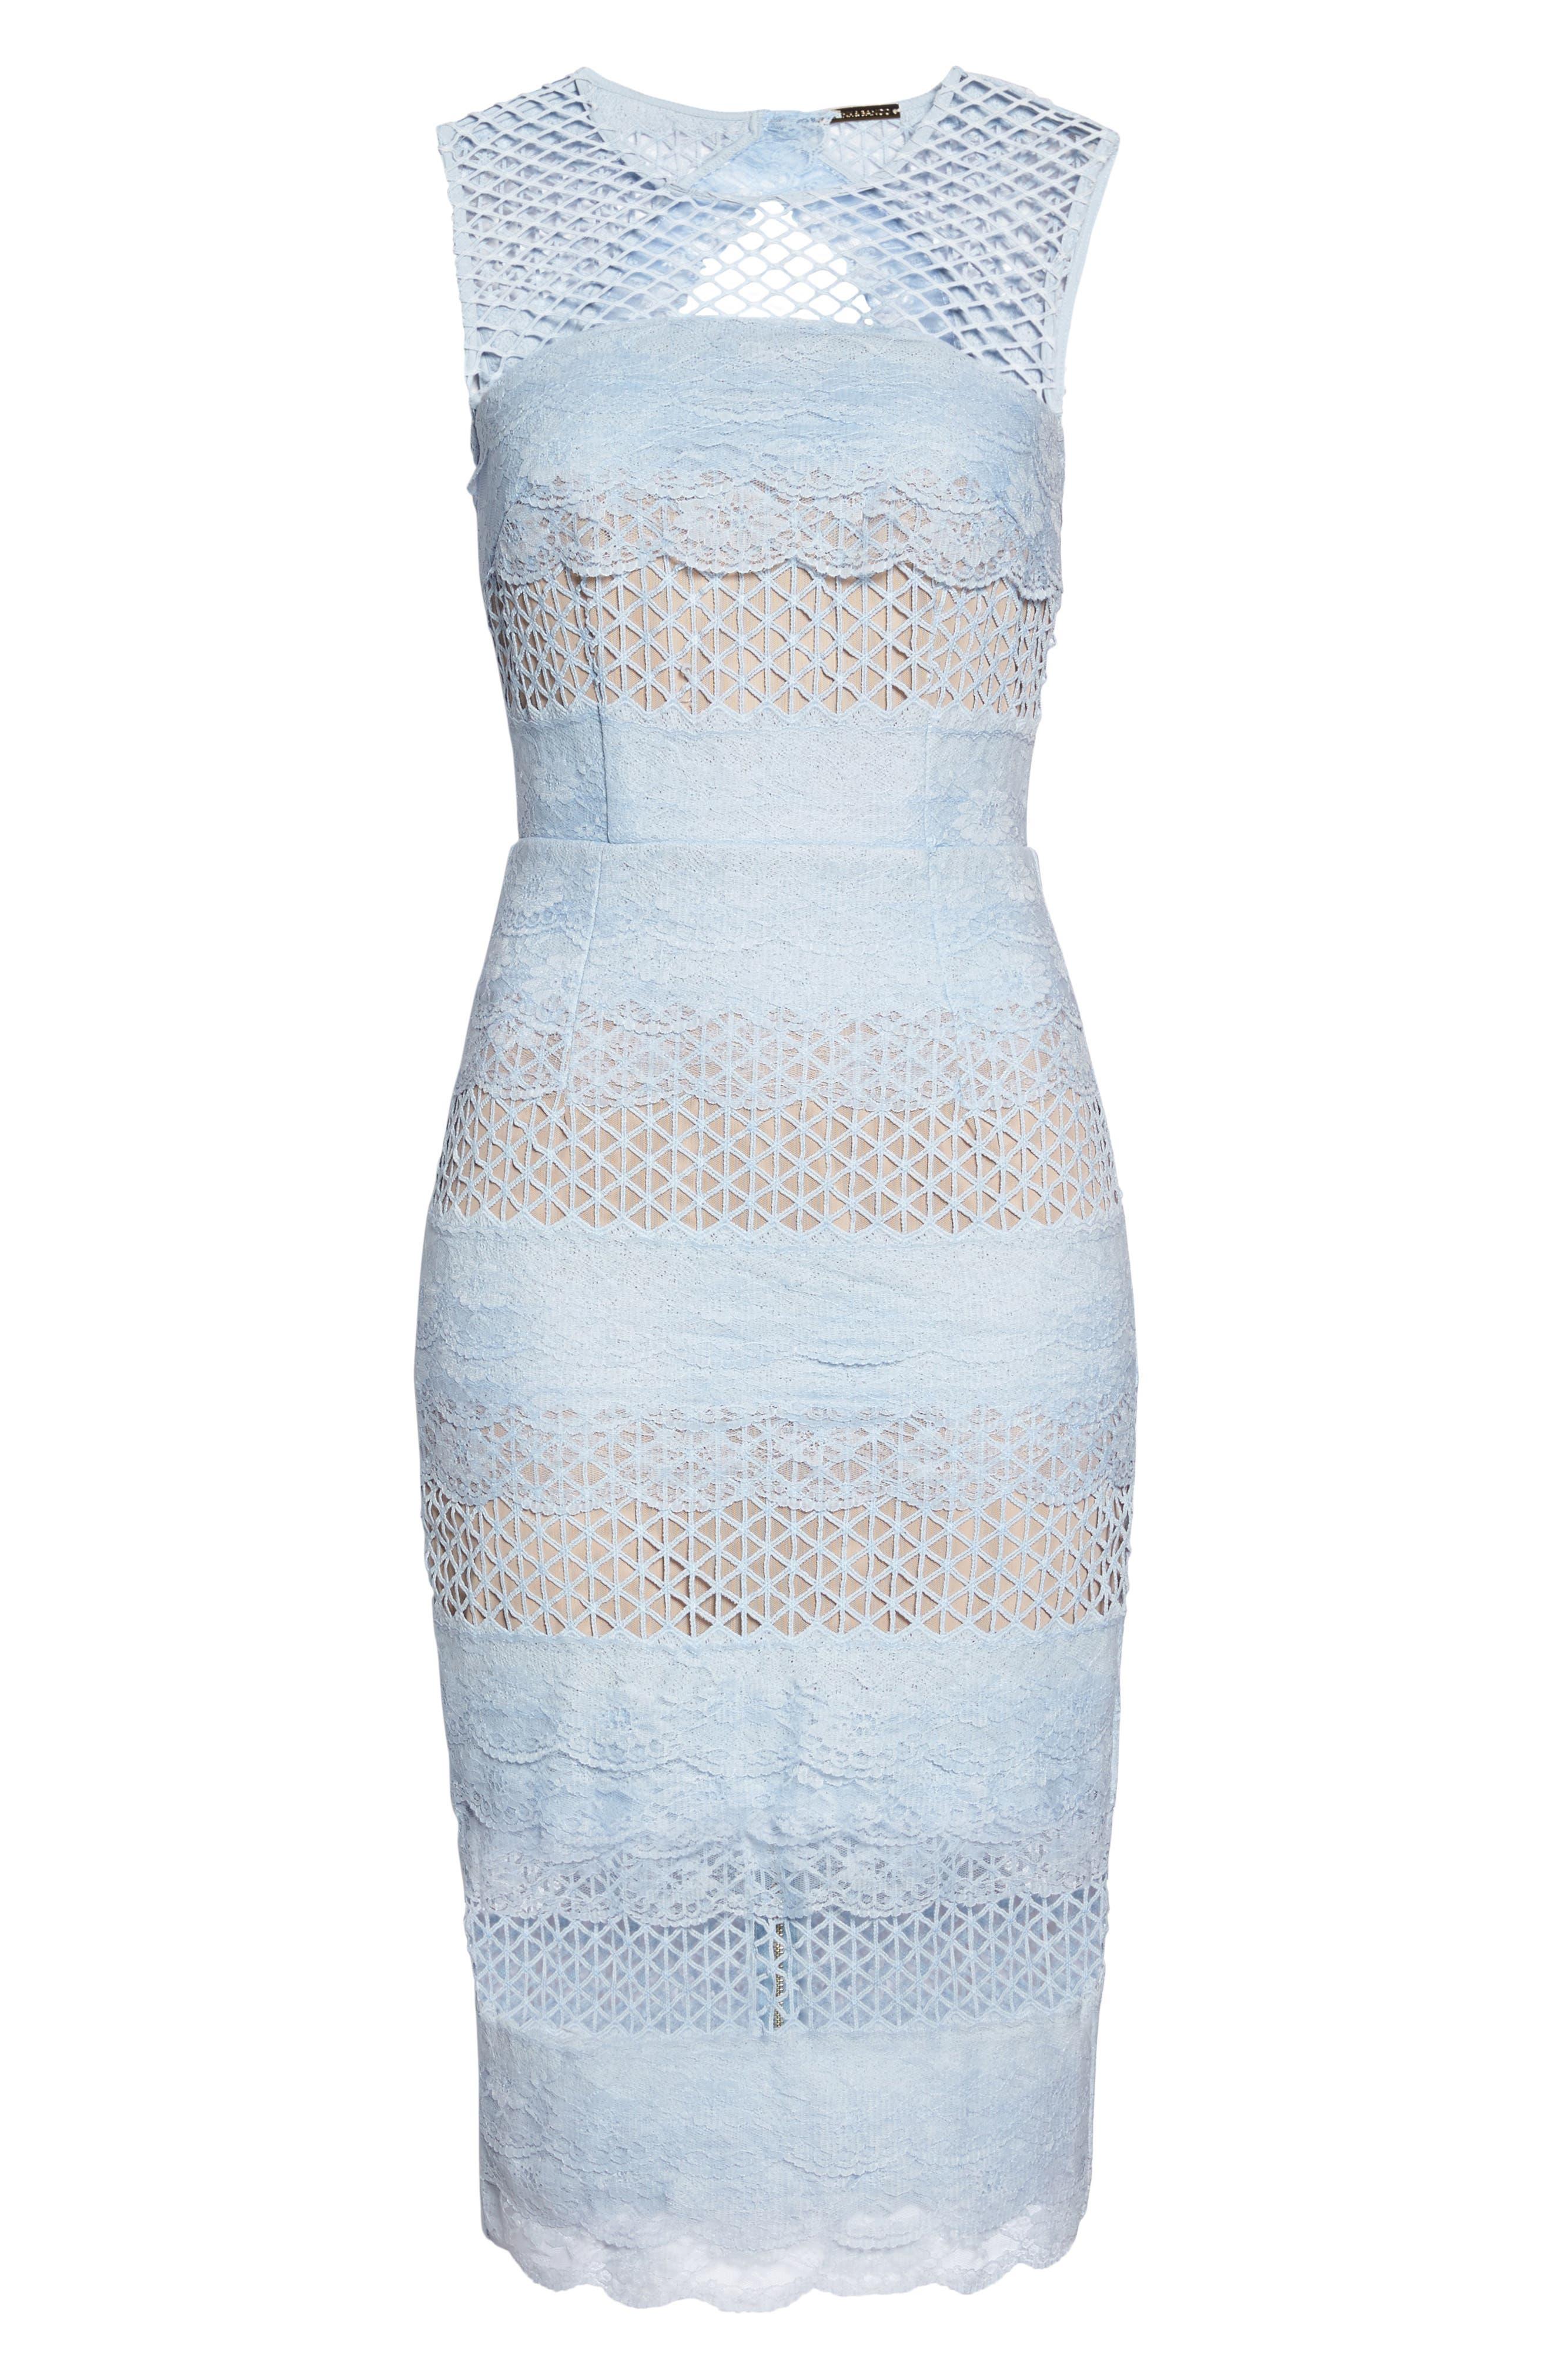 Sienna Lace Panel Sheath Dress,                             Alternate thumbnail 10, color,                             Sky